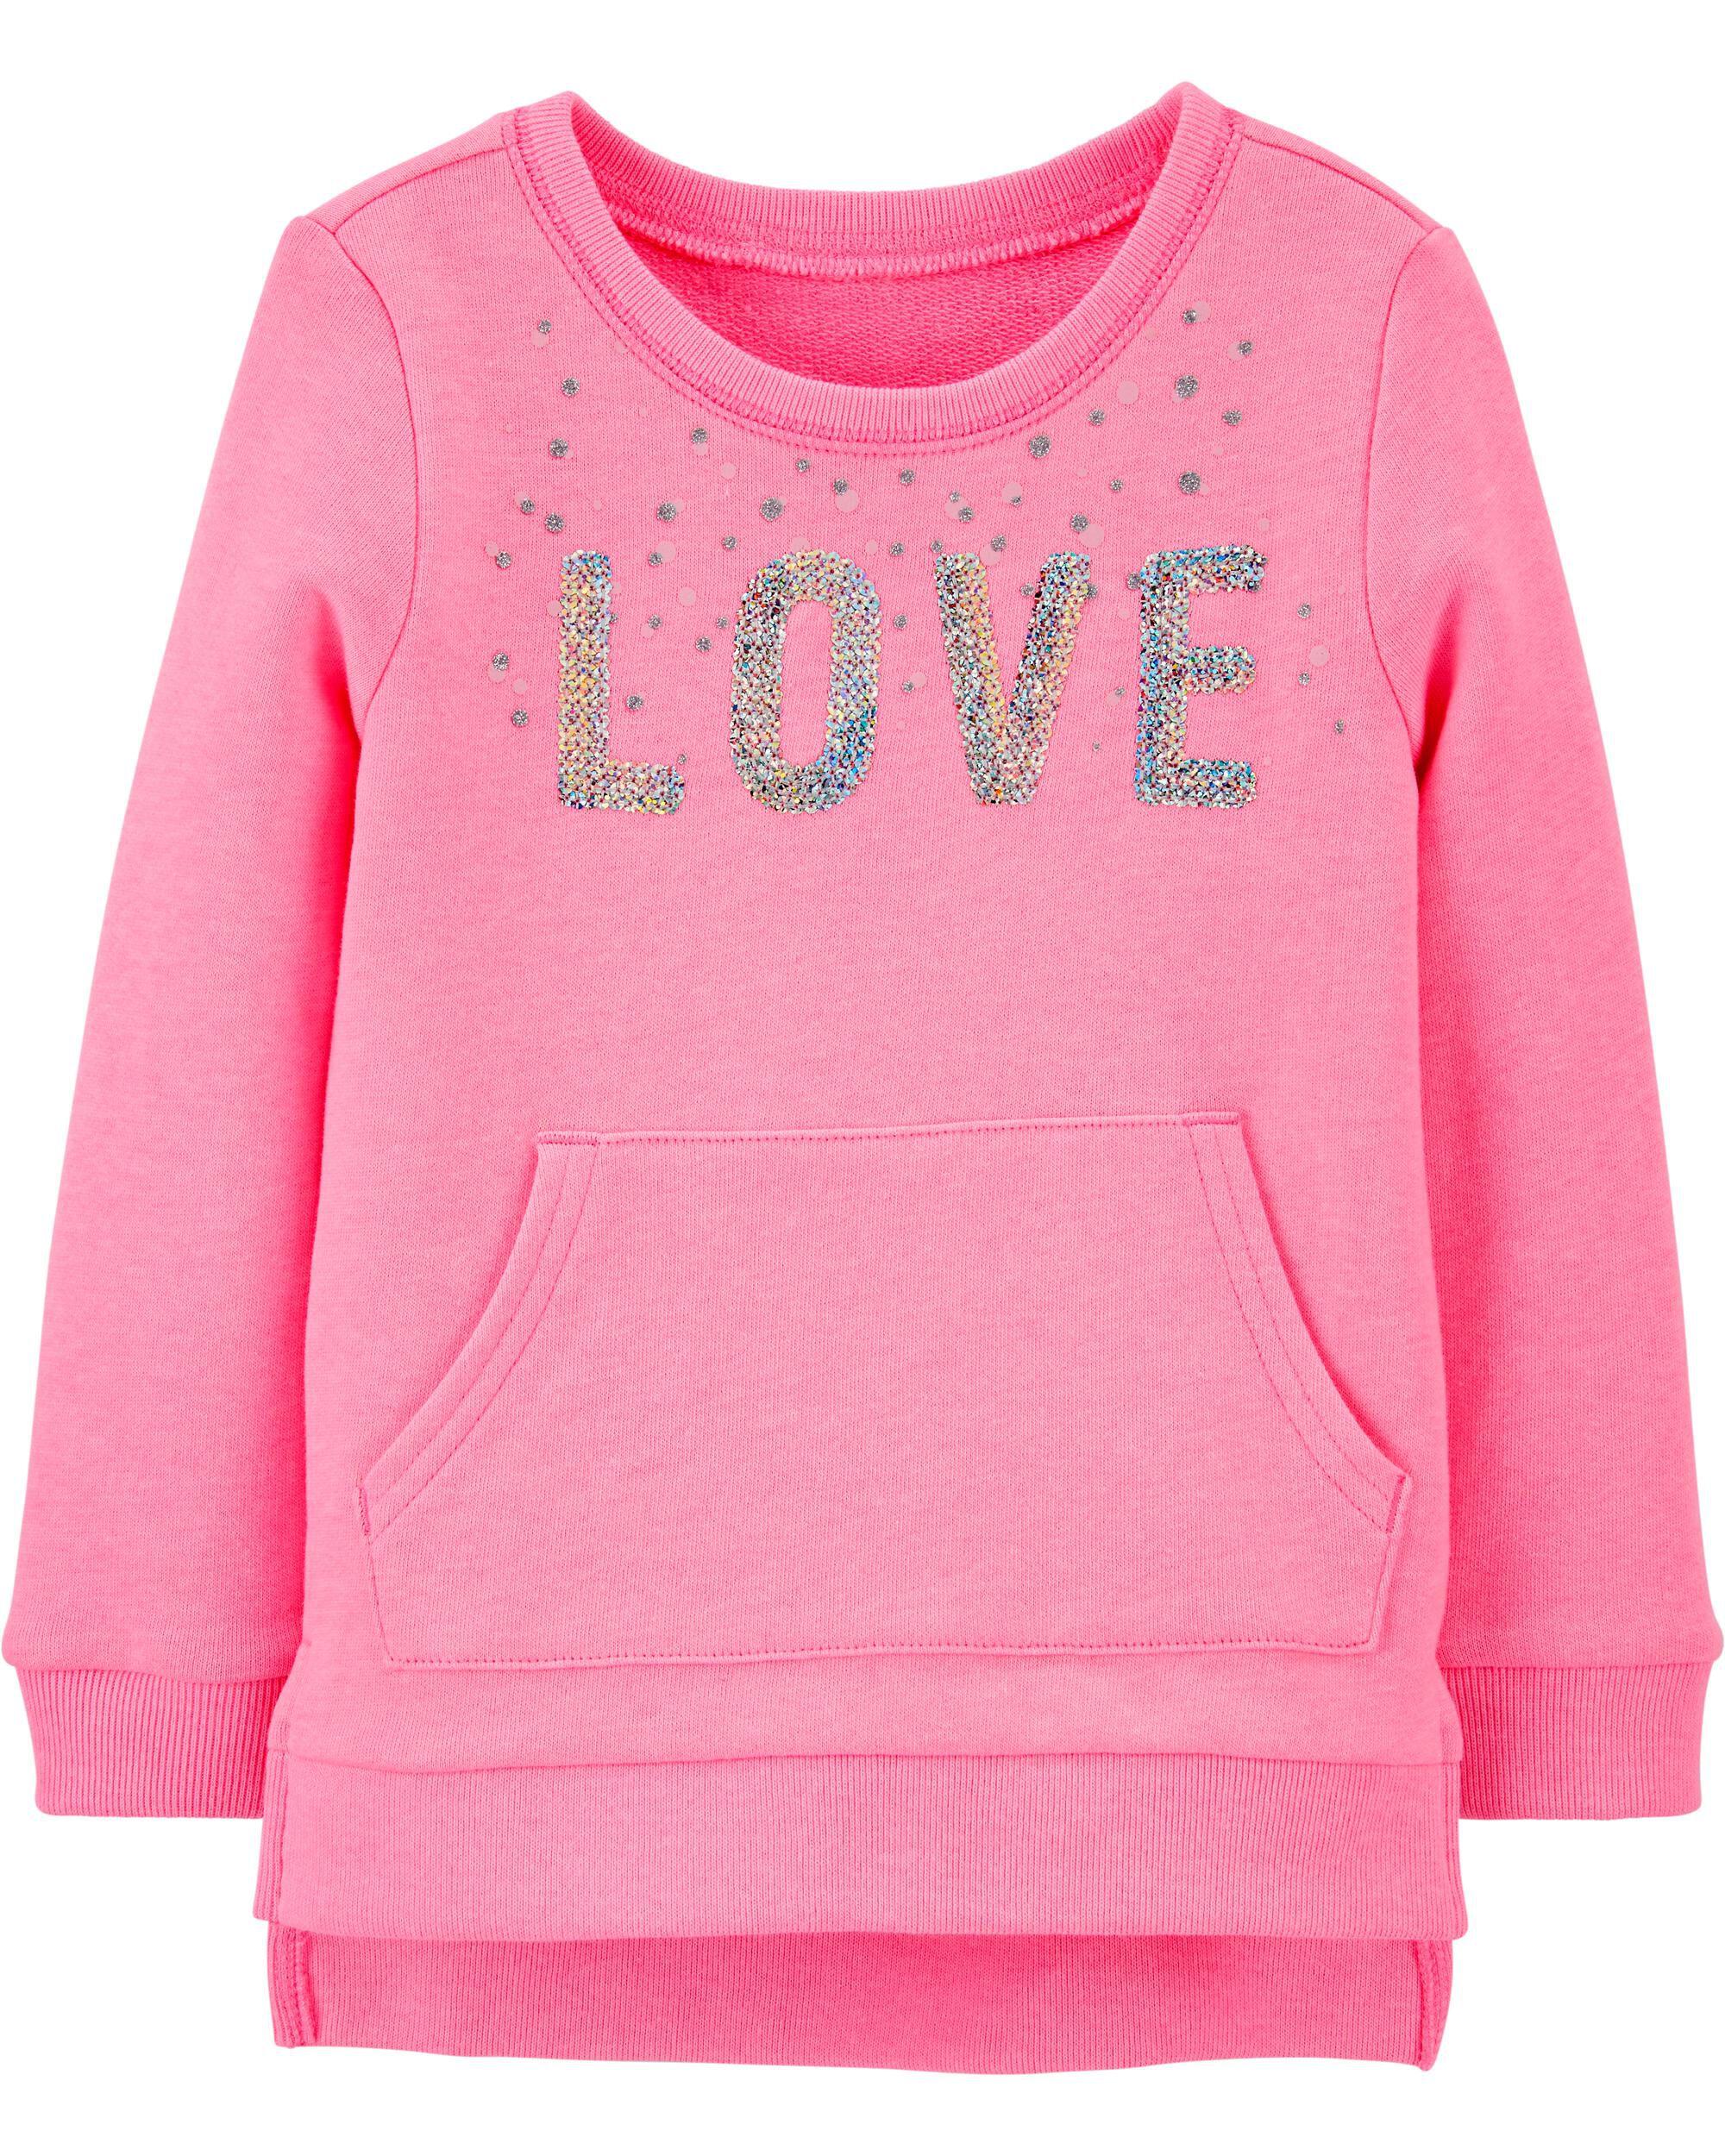 *Clearance*  Sequin Sweatshirt Tunic